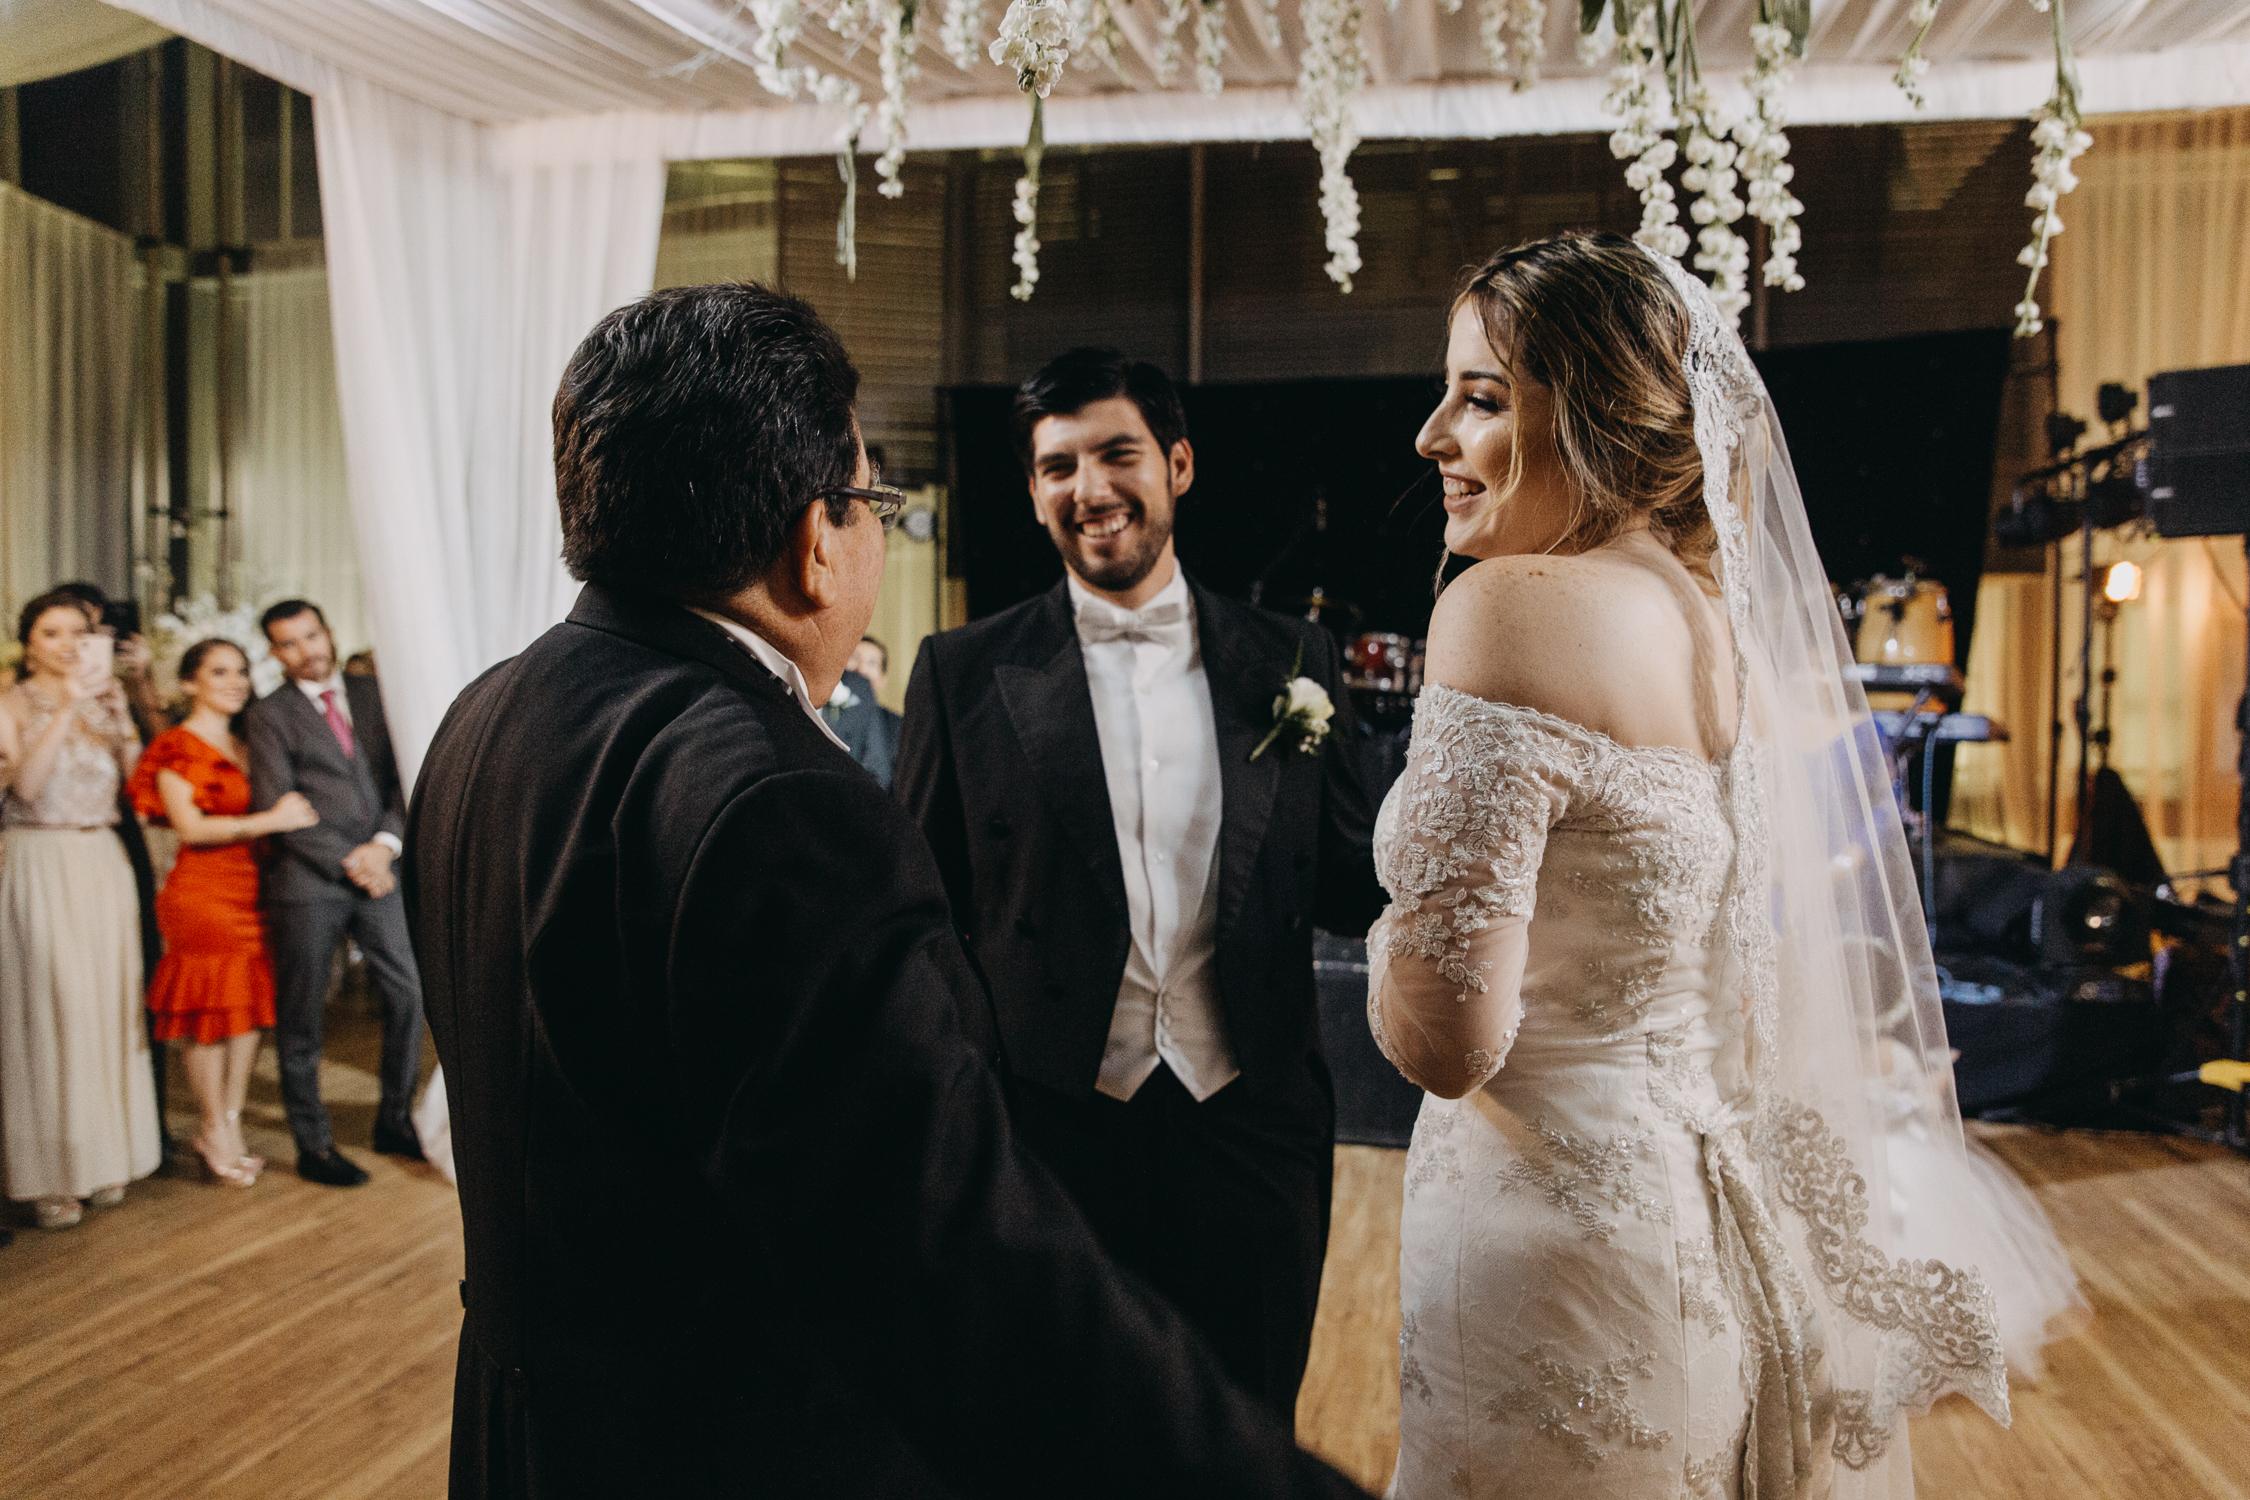 Michelle-Agurto-Fotografia-Bodas-Ecuador-Destination-Wedding-Photographer-Vicky-Javier-141.JPG